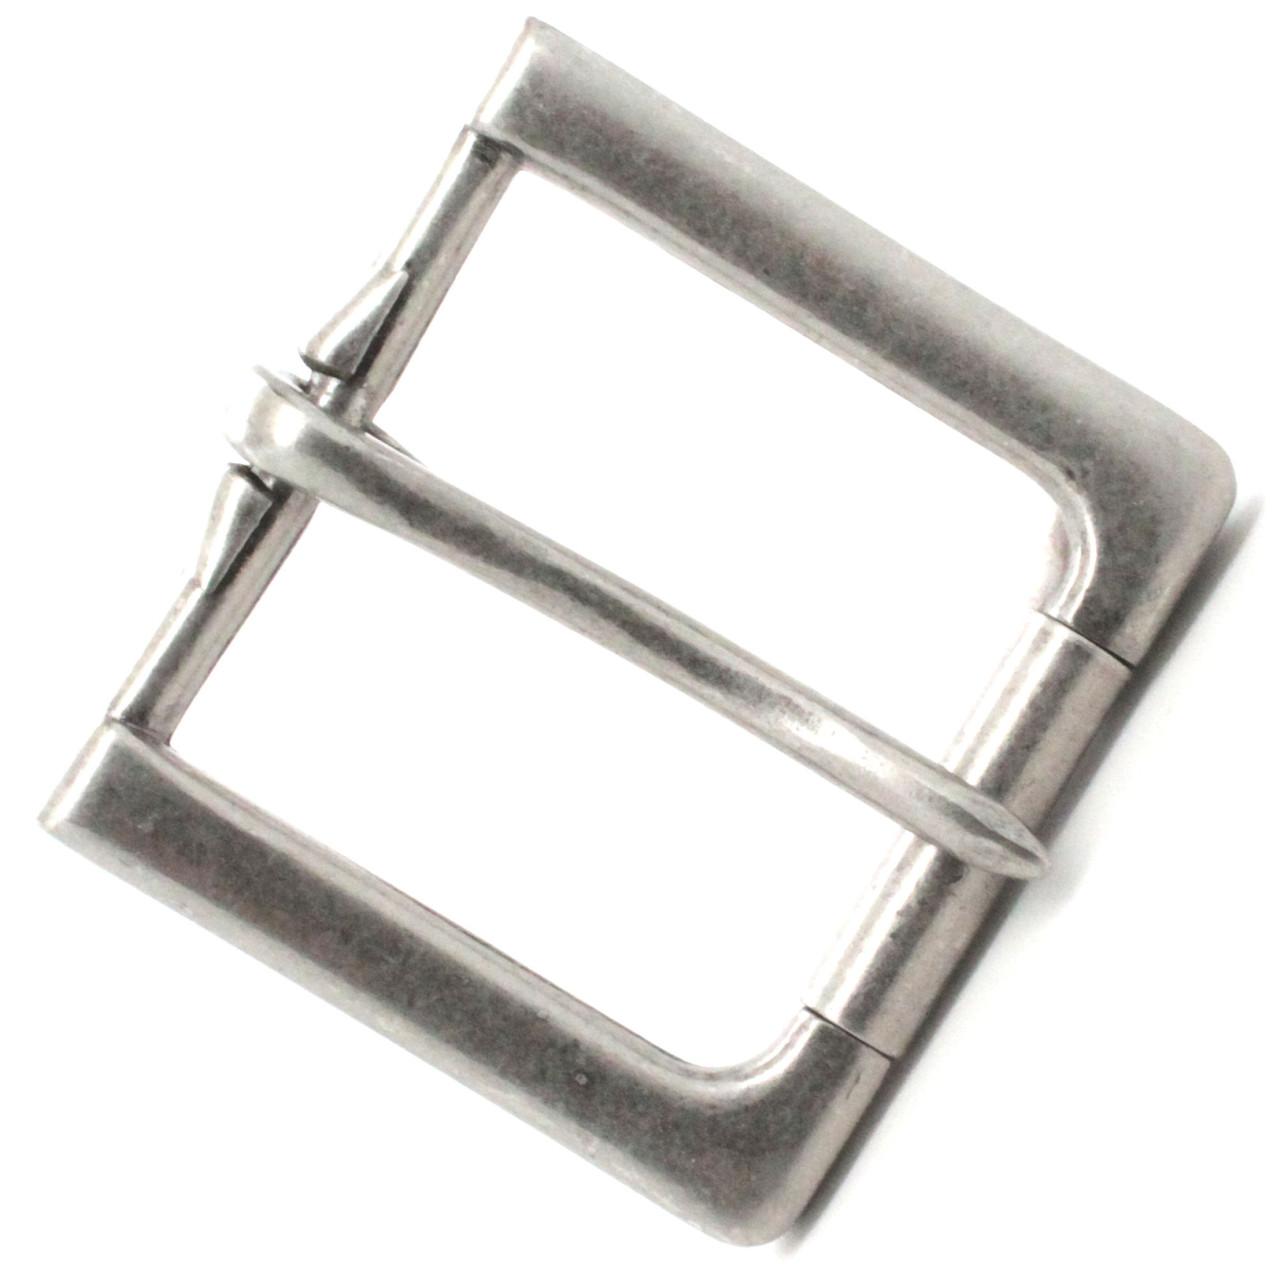 "Rugged Roller Belt Buckle Antique Nickel 1-1/2"" Top"